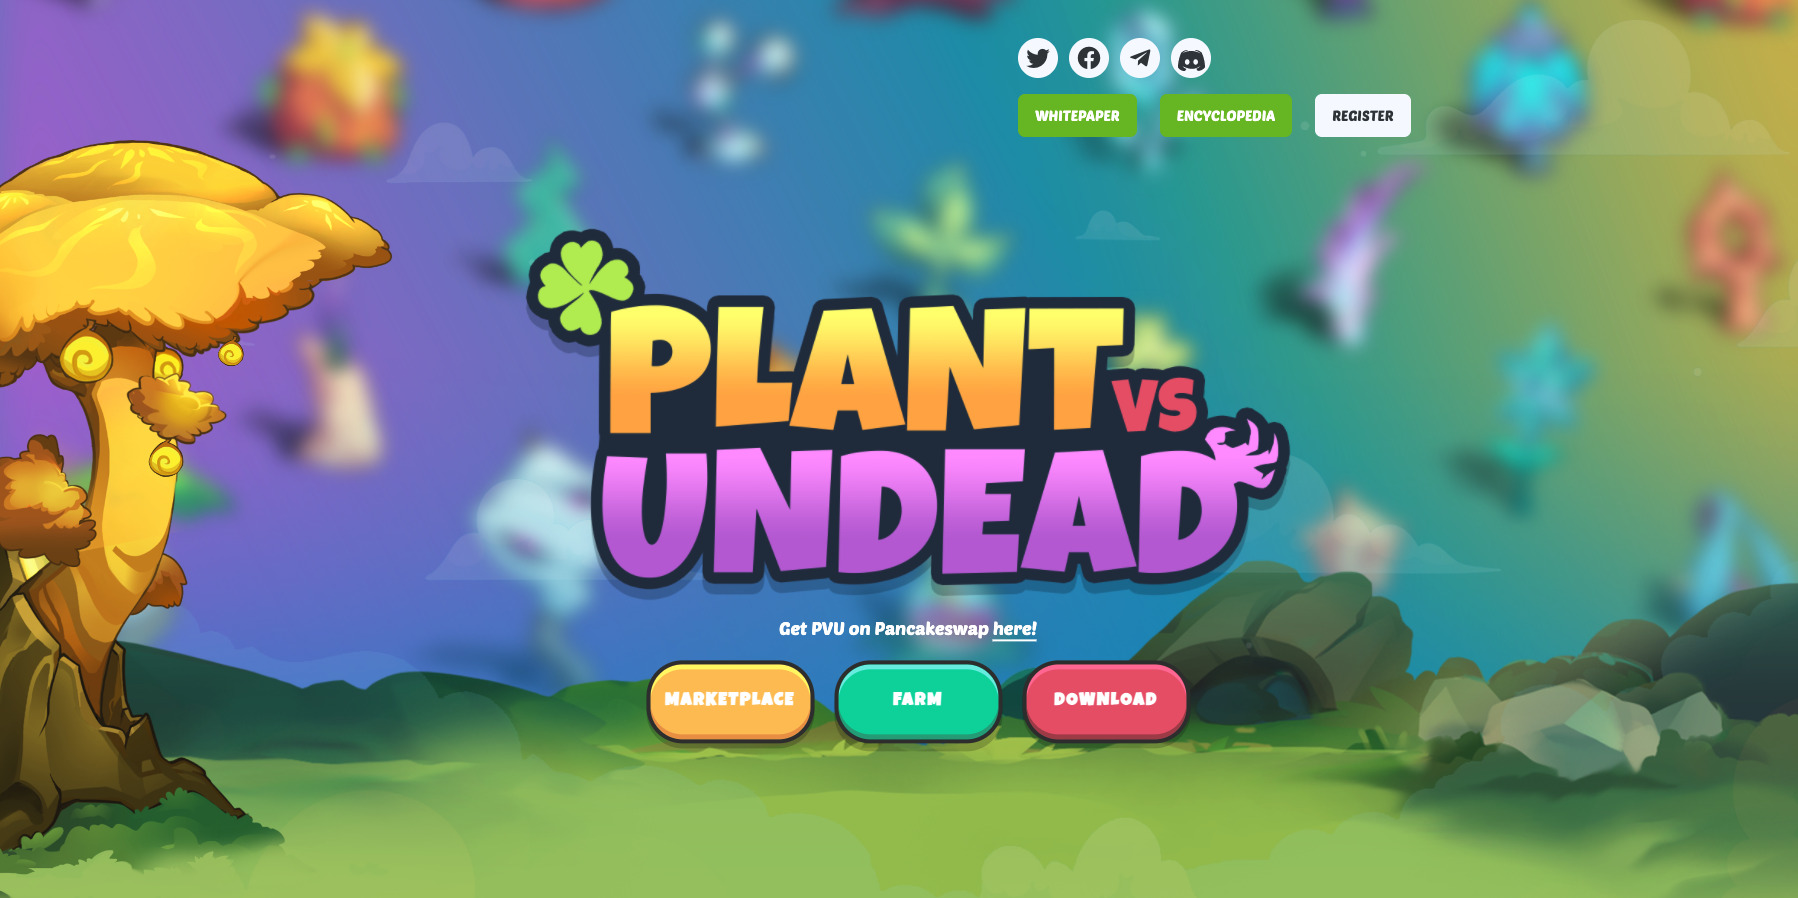 Best upcoming NFT games - Plants vs Undead